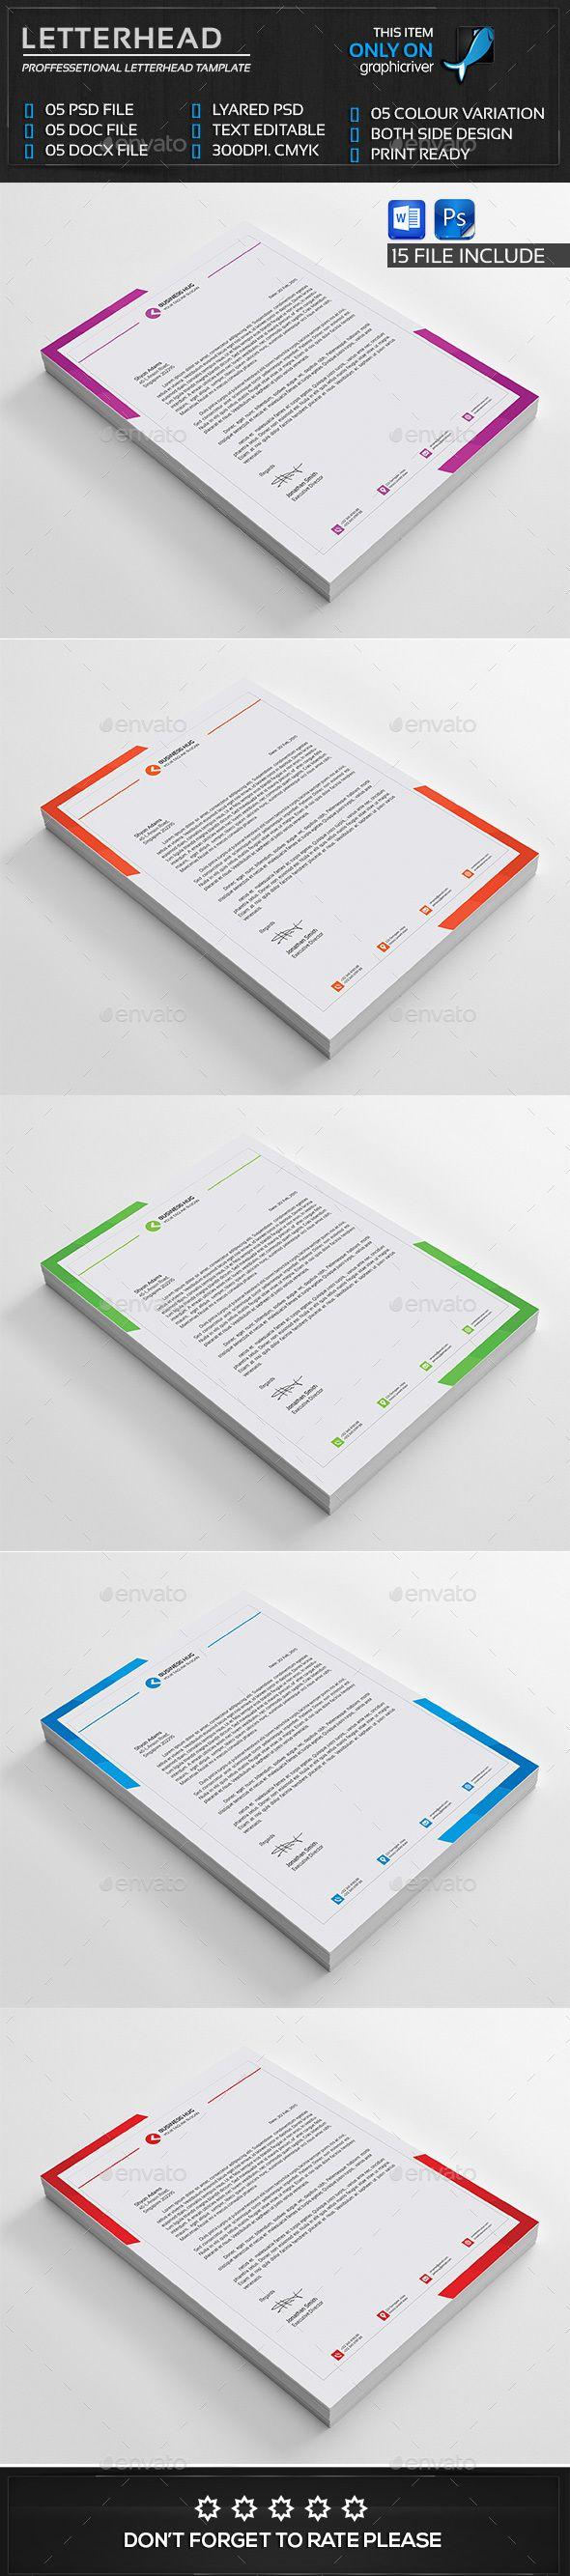 Corporate Letterhead - Stationery Print Templates | Letterhead ...